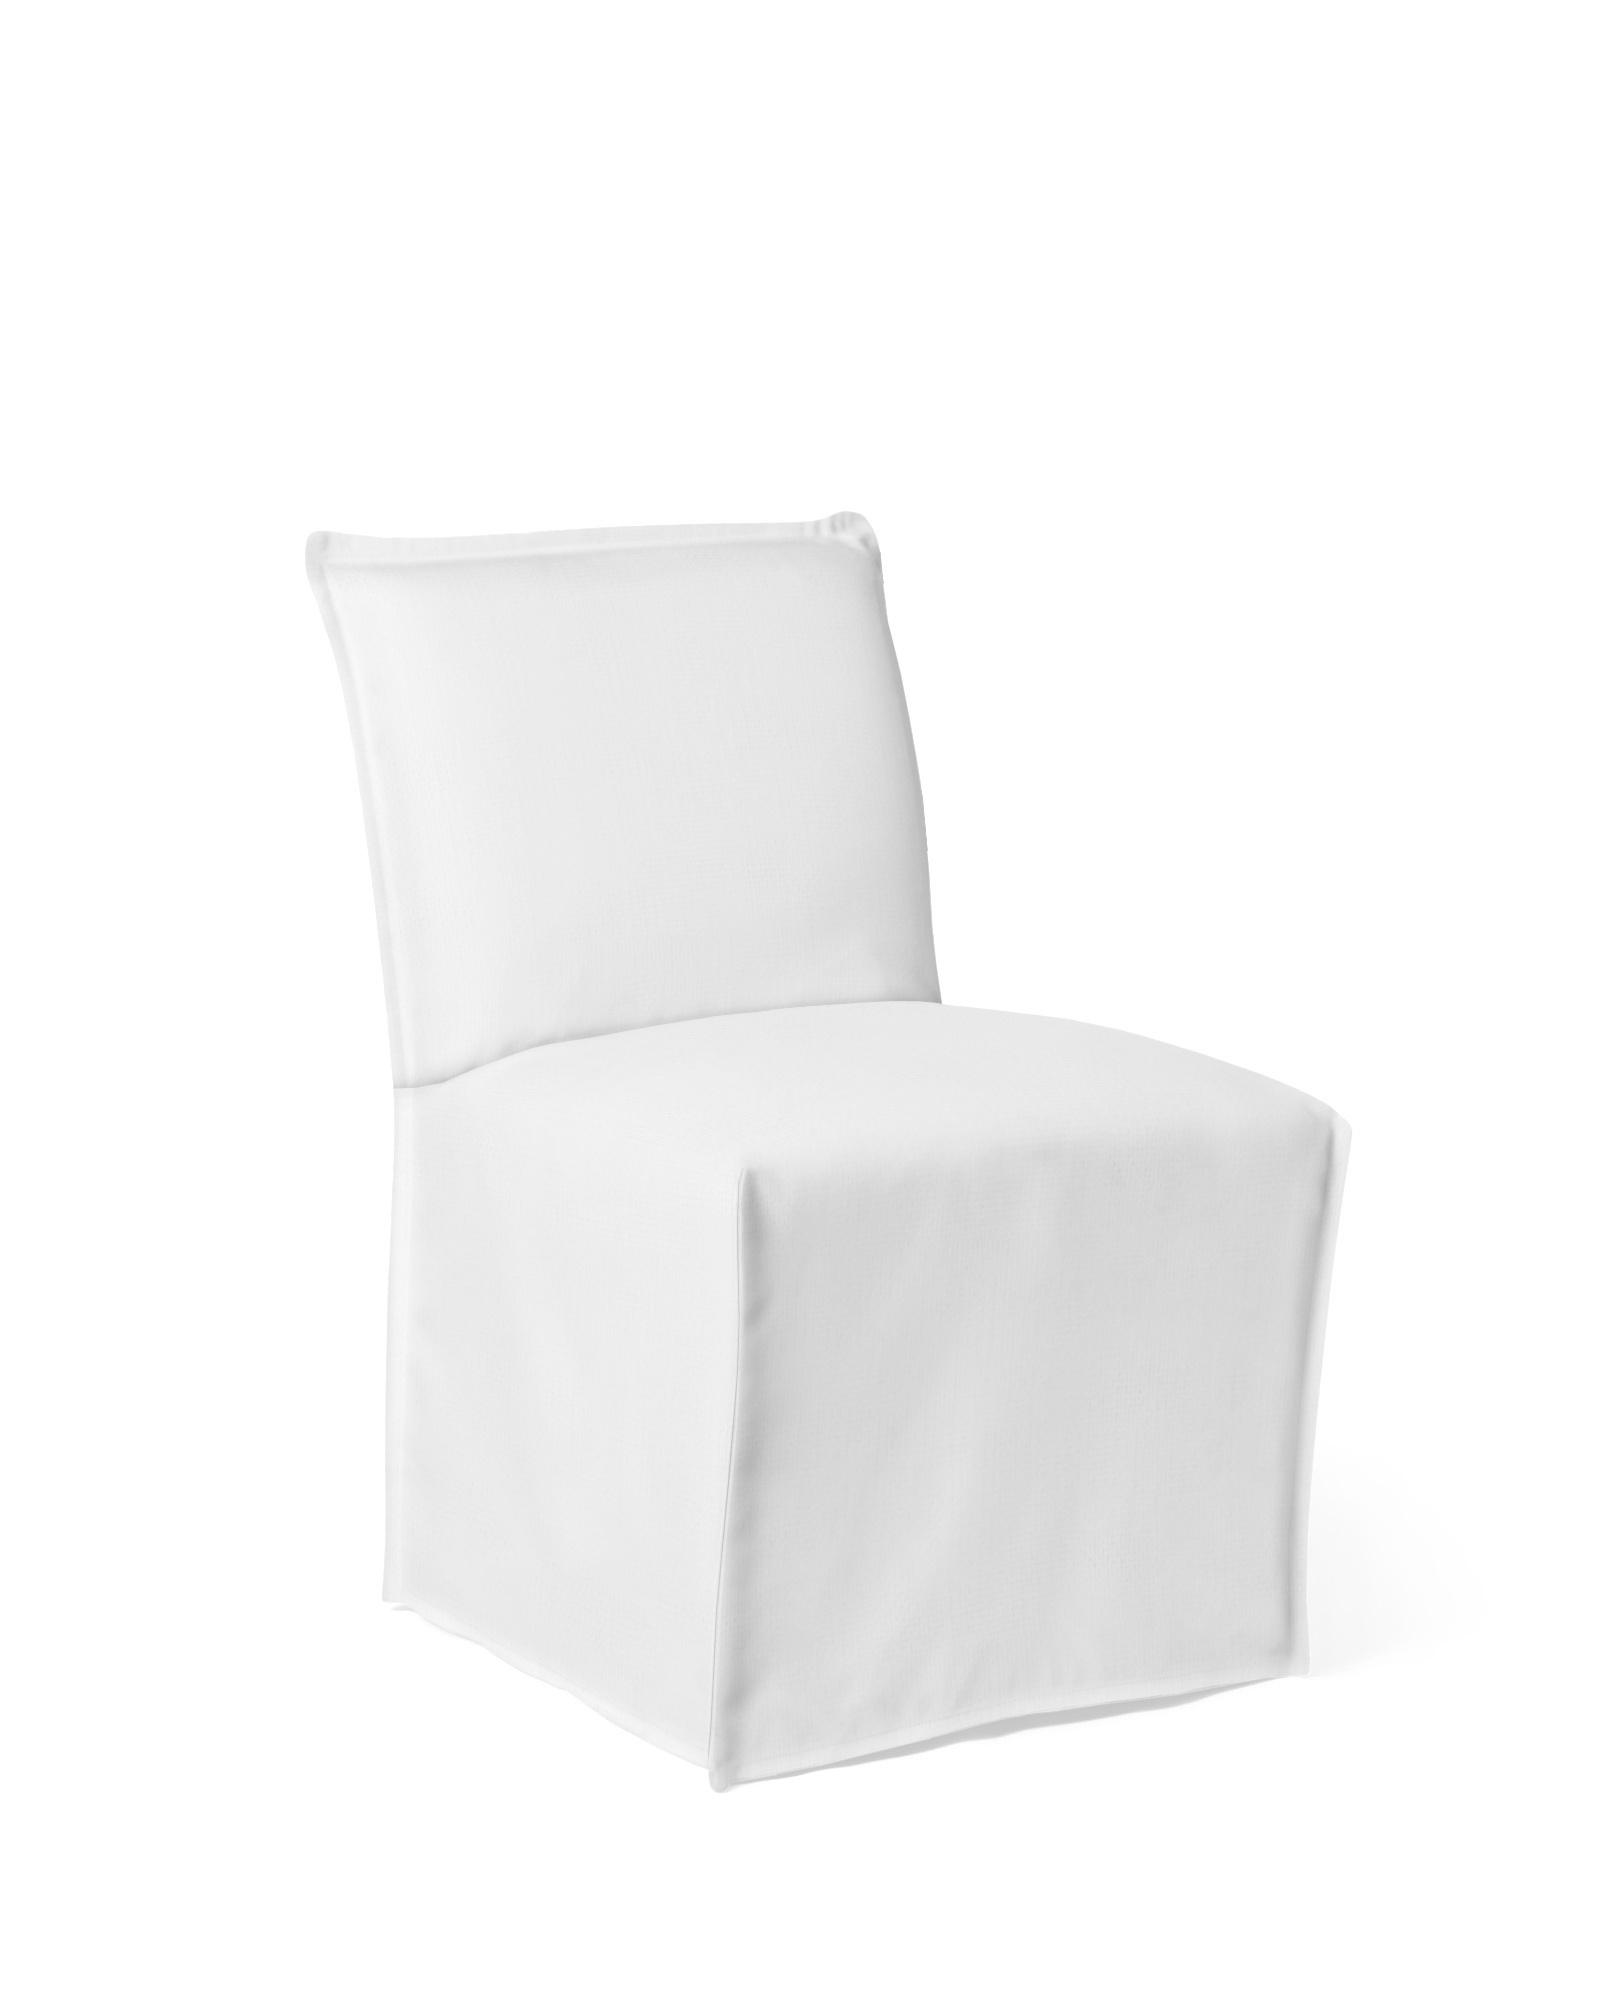 Sundial Outdoor Side Chair - Slipcovered